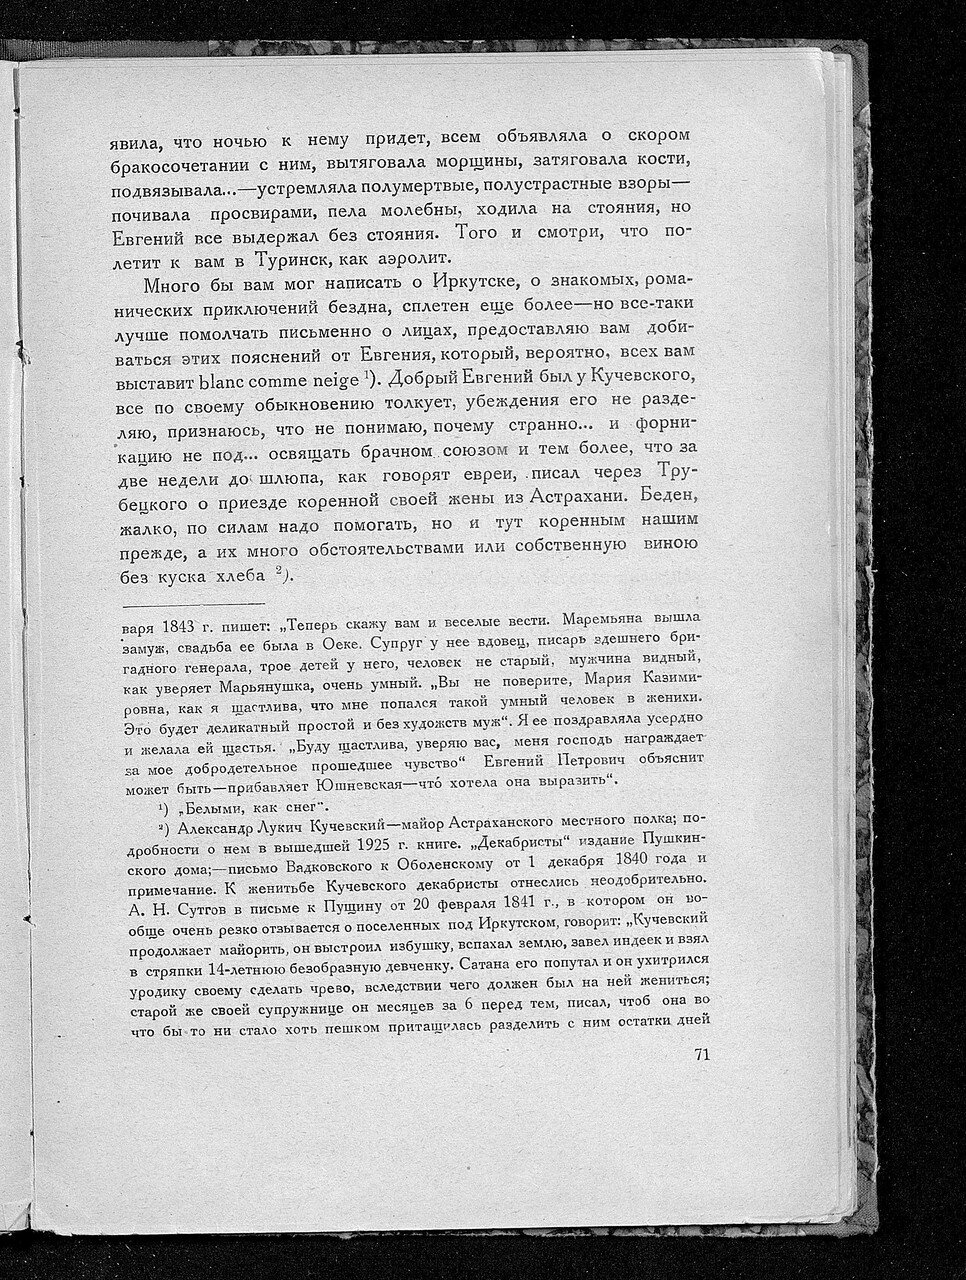 https://img-fotki.yandex.ru/get/878590/199368979.a1/0_214342_bfb644f0_XXXL.jpg